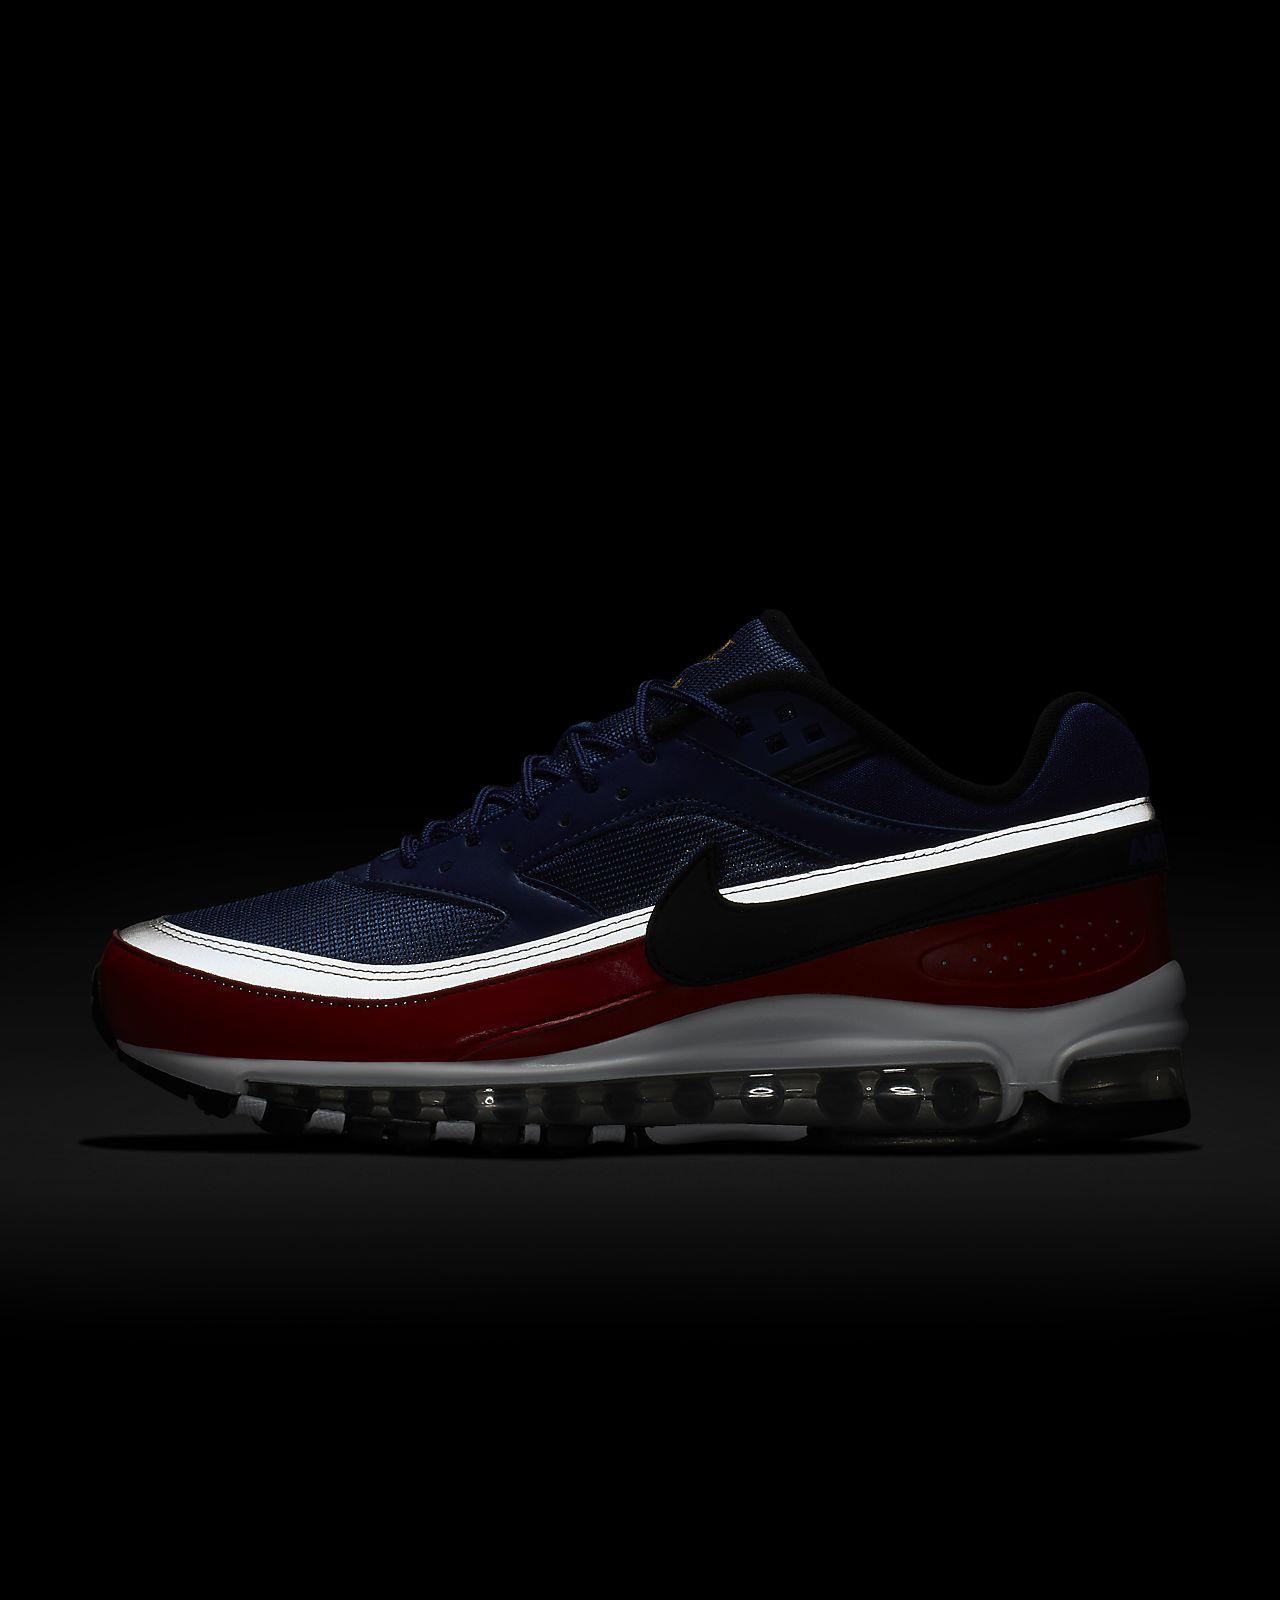 competitive price a4e39 e8826 ... Nike Air Max 97 BW Men s Shoe